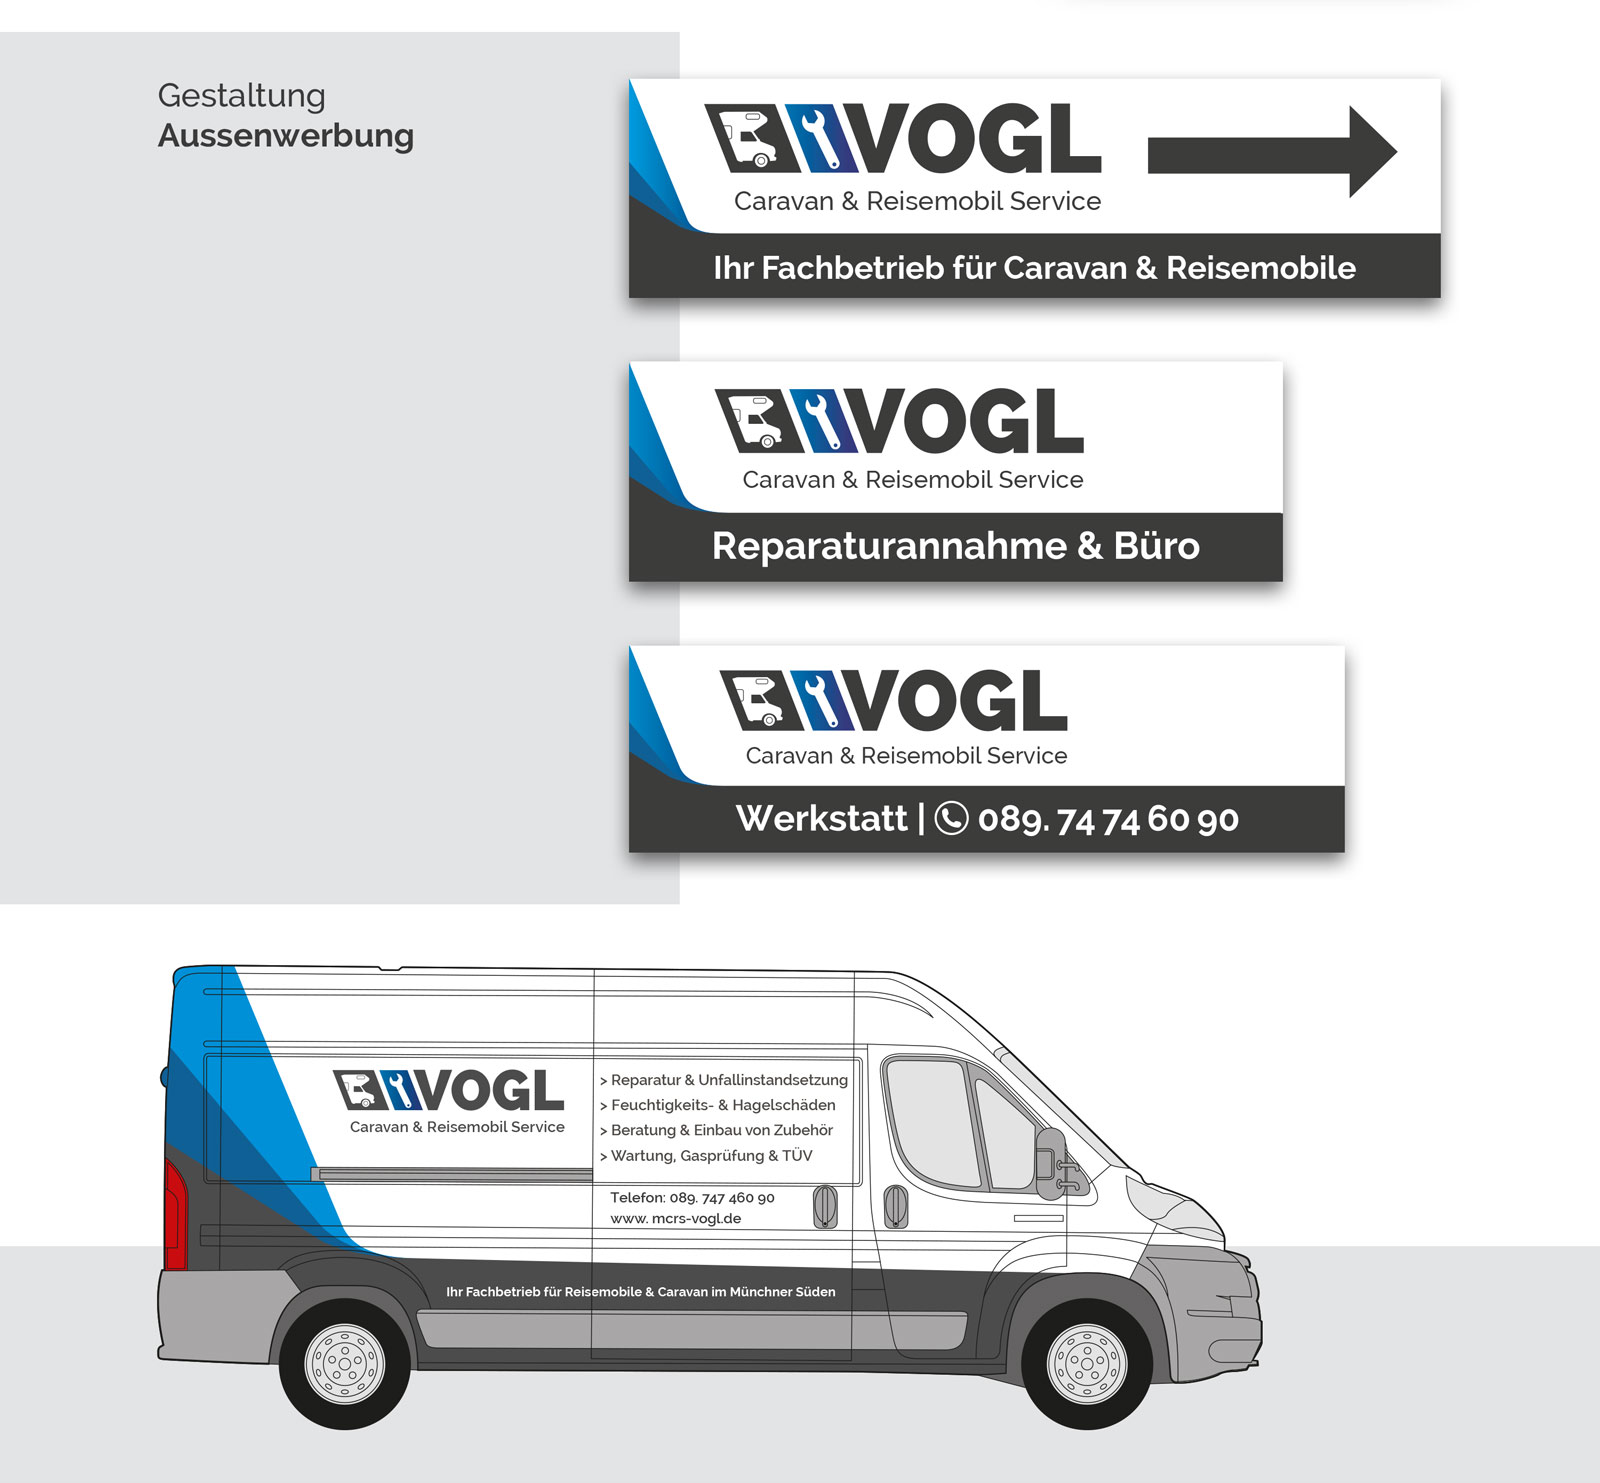 Vogl_Aussenwerbung_Fahrzeugdesign_5.jpg